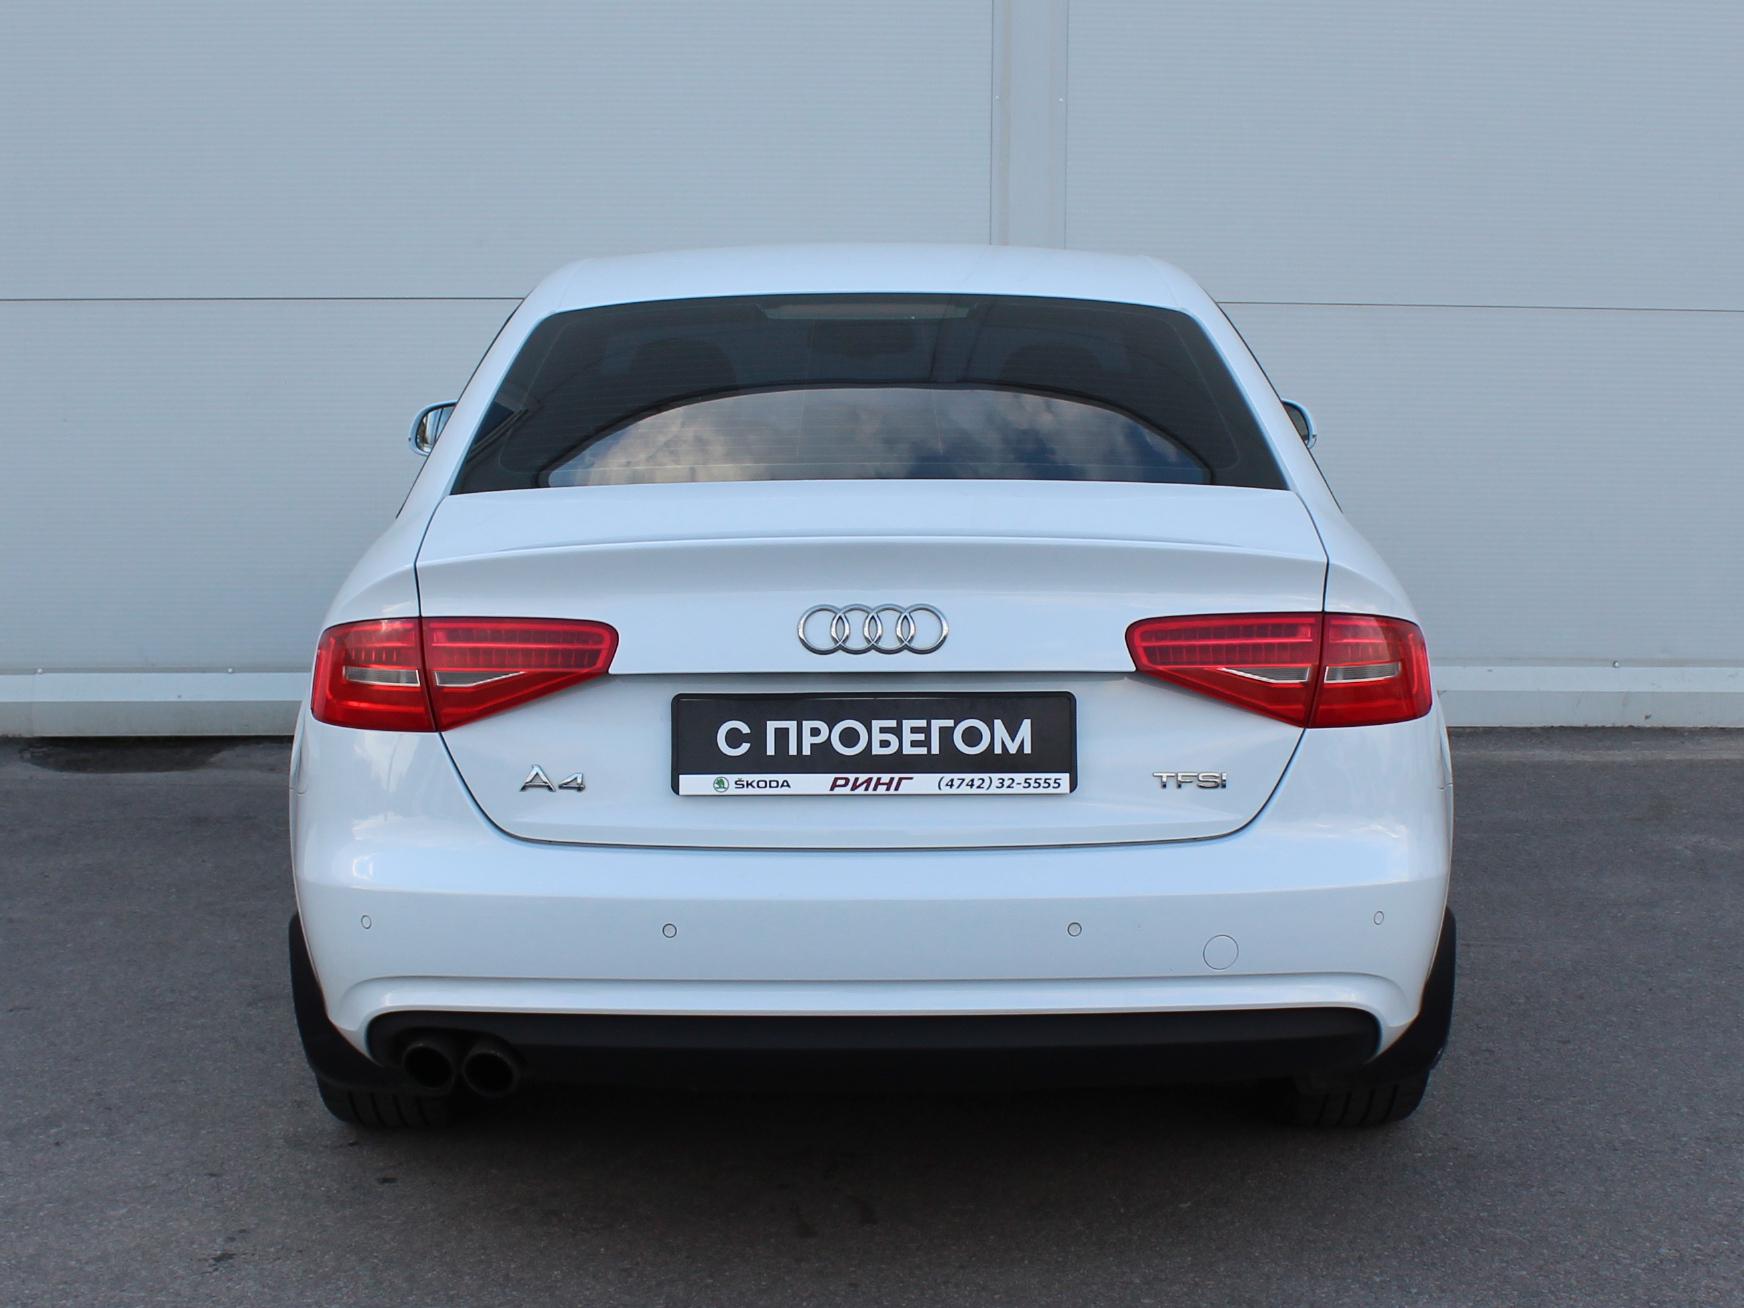 Audi A4 Седан (2014г.)